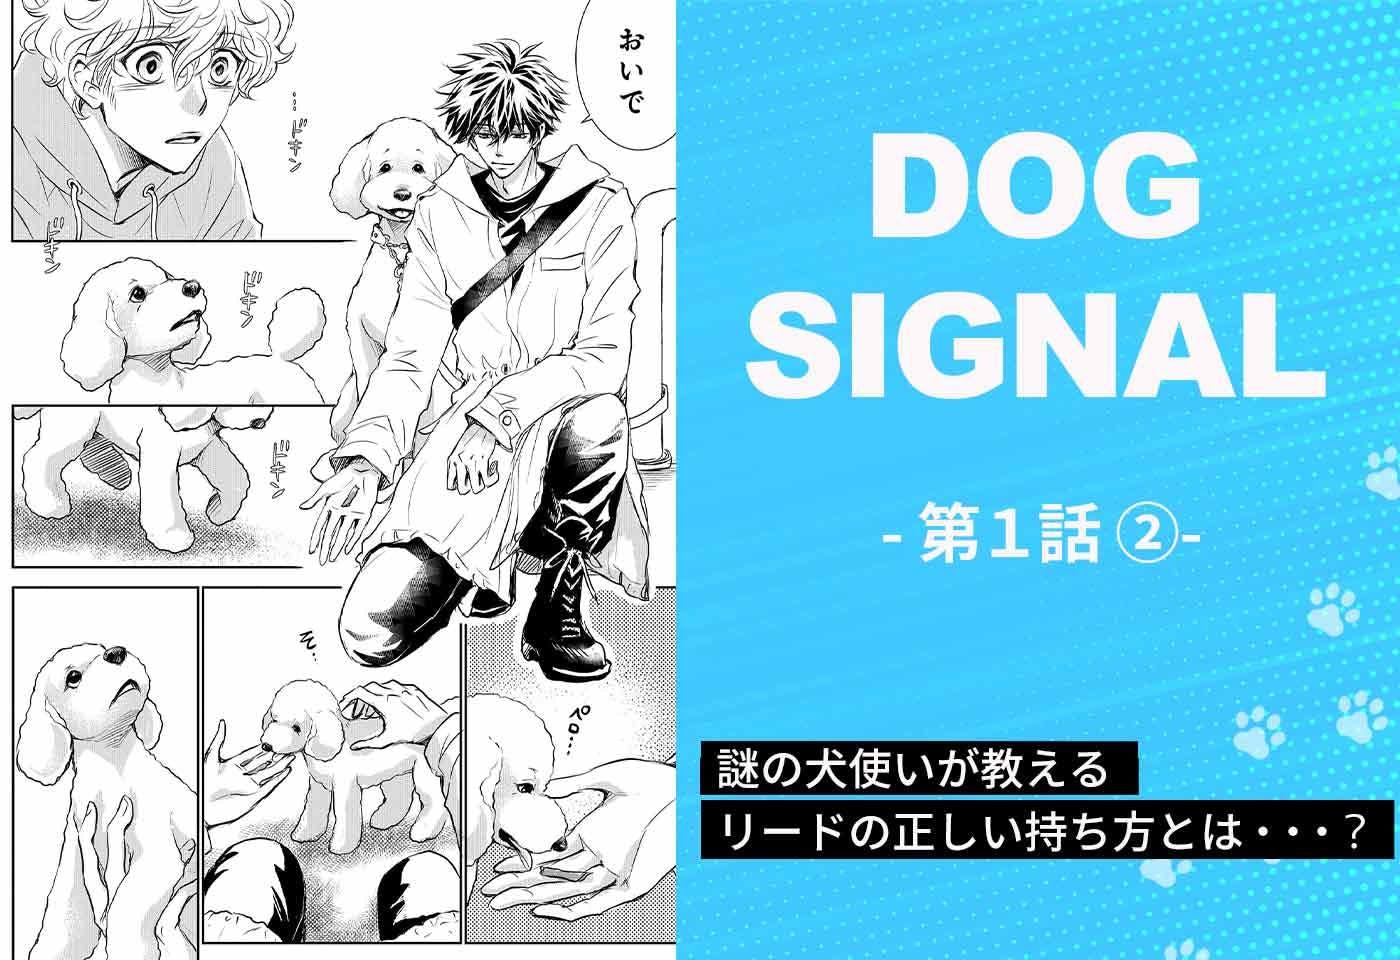 【新連載】『DOG SIGNAL』1話目 2/4